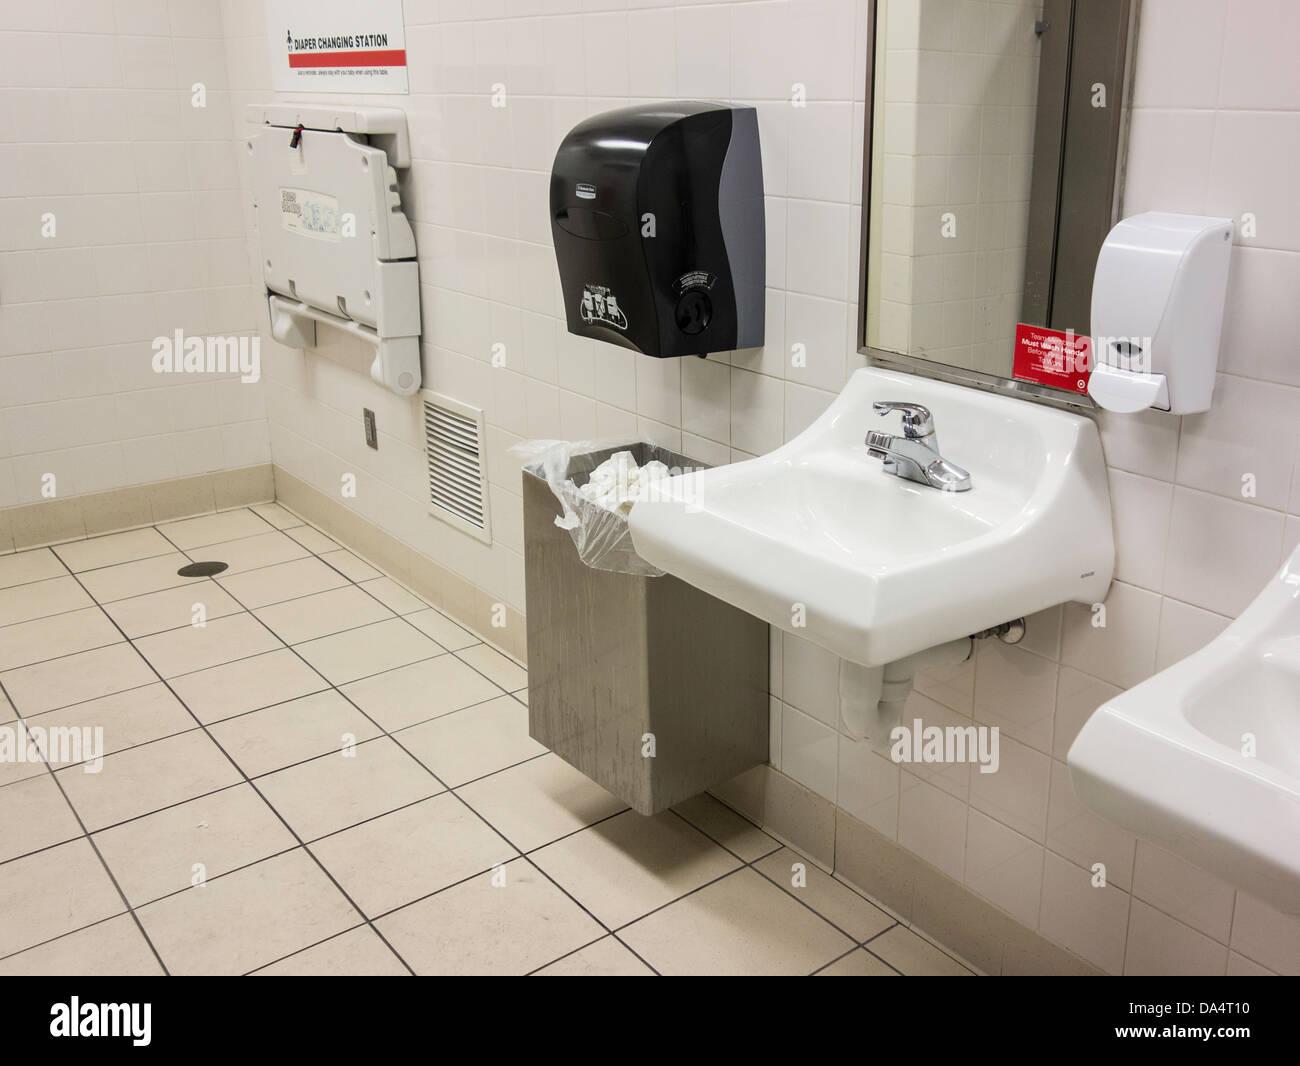 public bathroom in a shopping mall lavatories soap dispenser and mirrors oklahoma city oklahoma usa